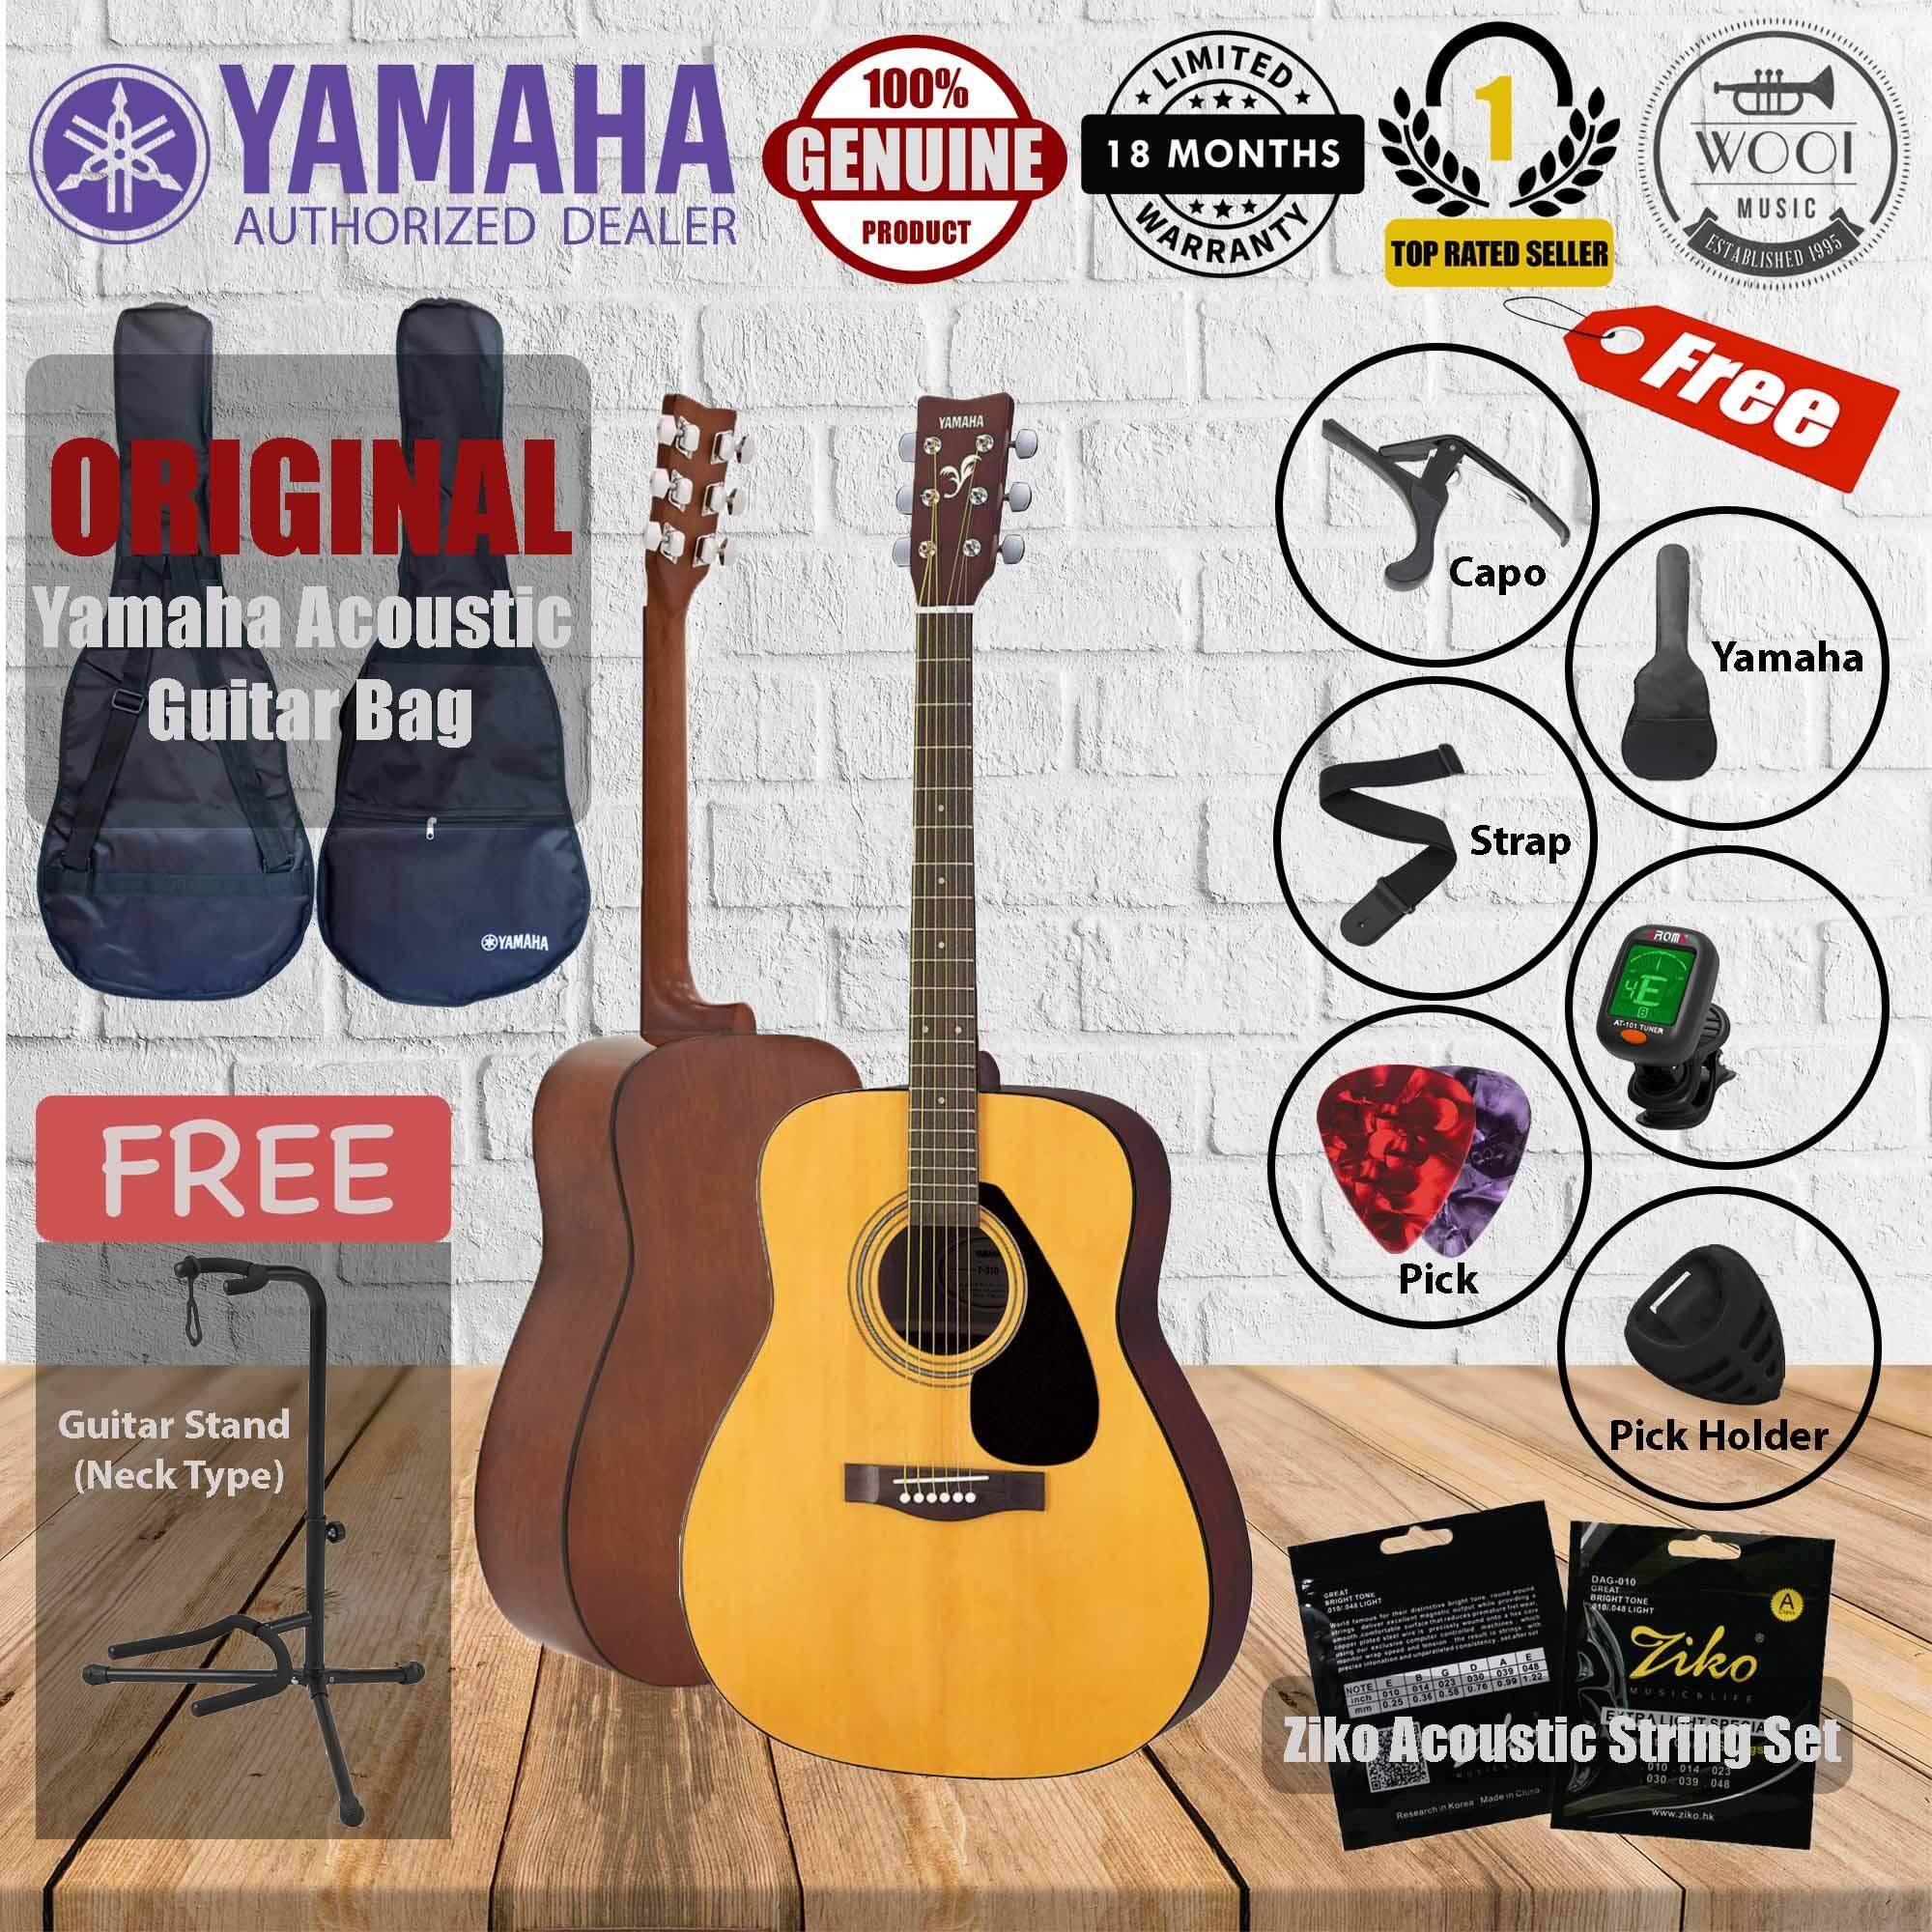 "Yamaha F310 Acoustic Guitar 41""(F-310) (FREE Yamaha bag, Tuner, Capo, Strap, Pick x 2, Ziko Strings, Pick Holder,  GS002 Neck type guitar stand)"